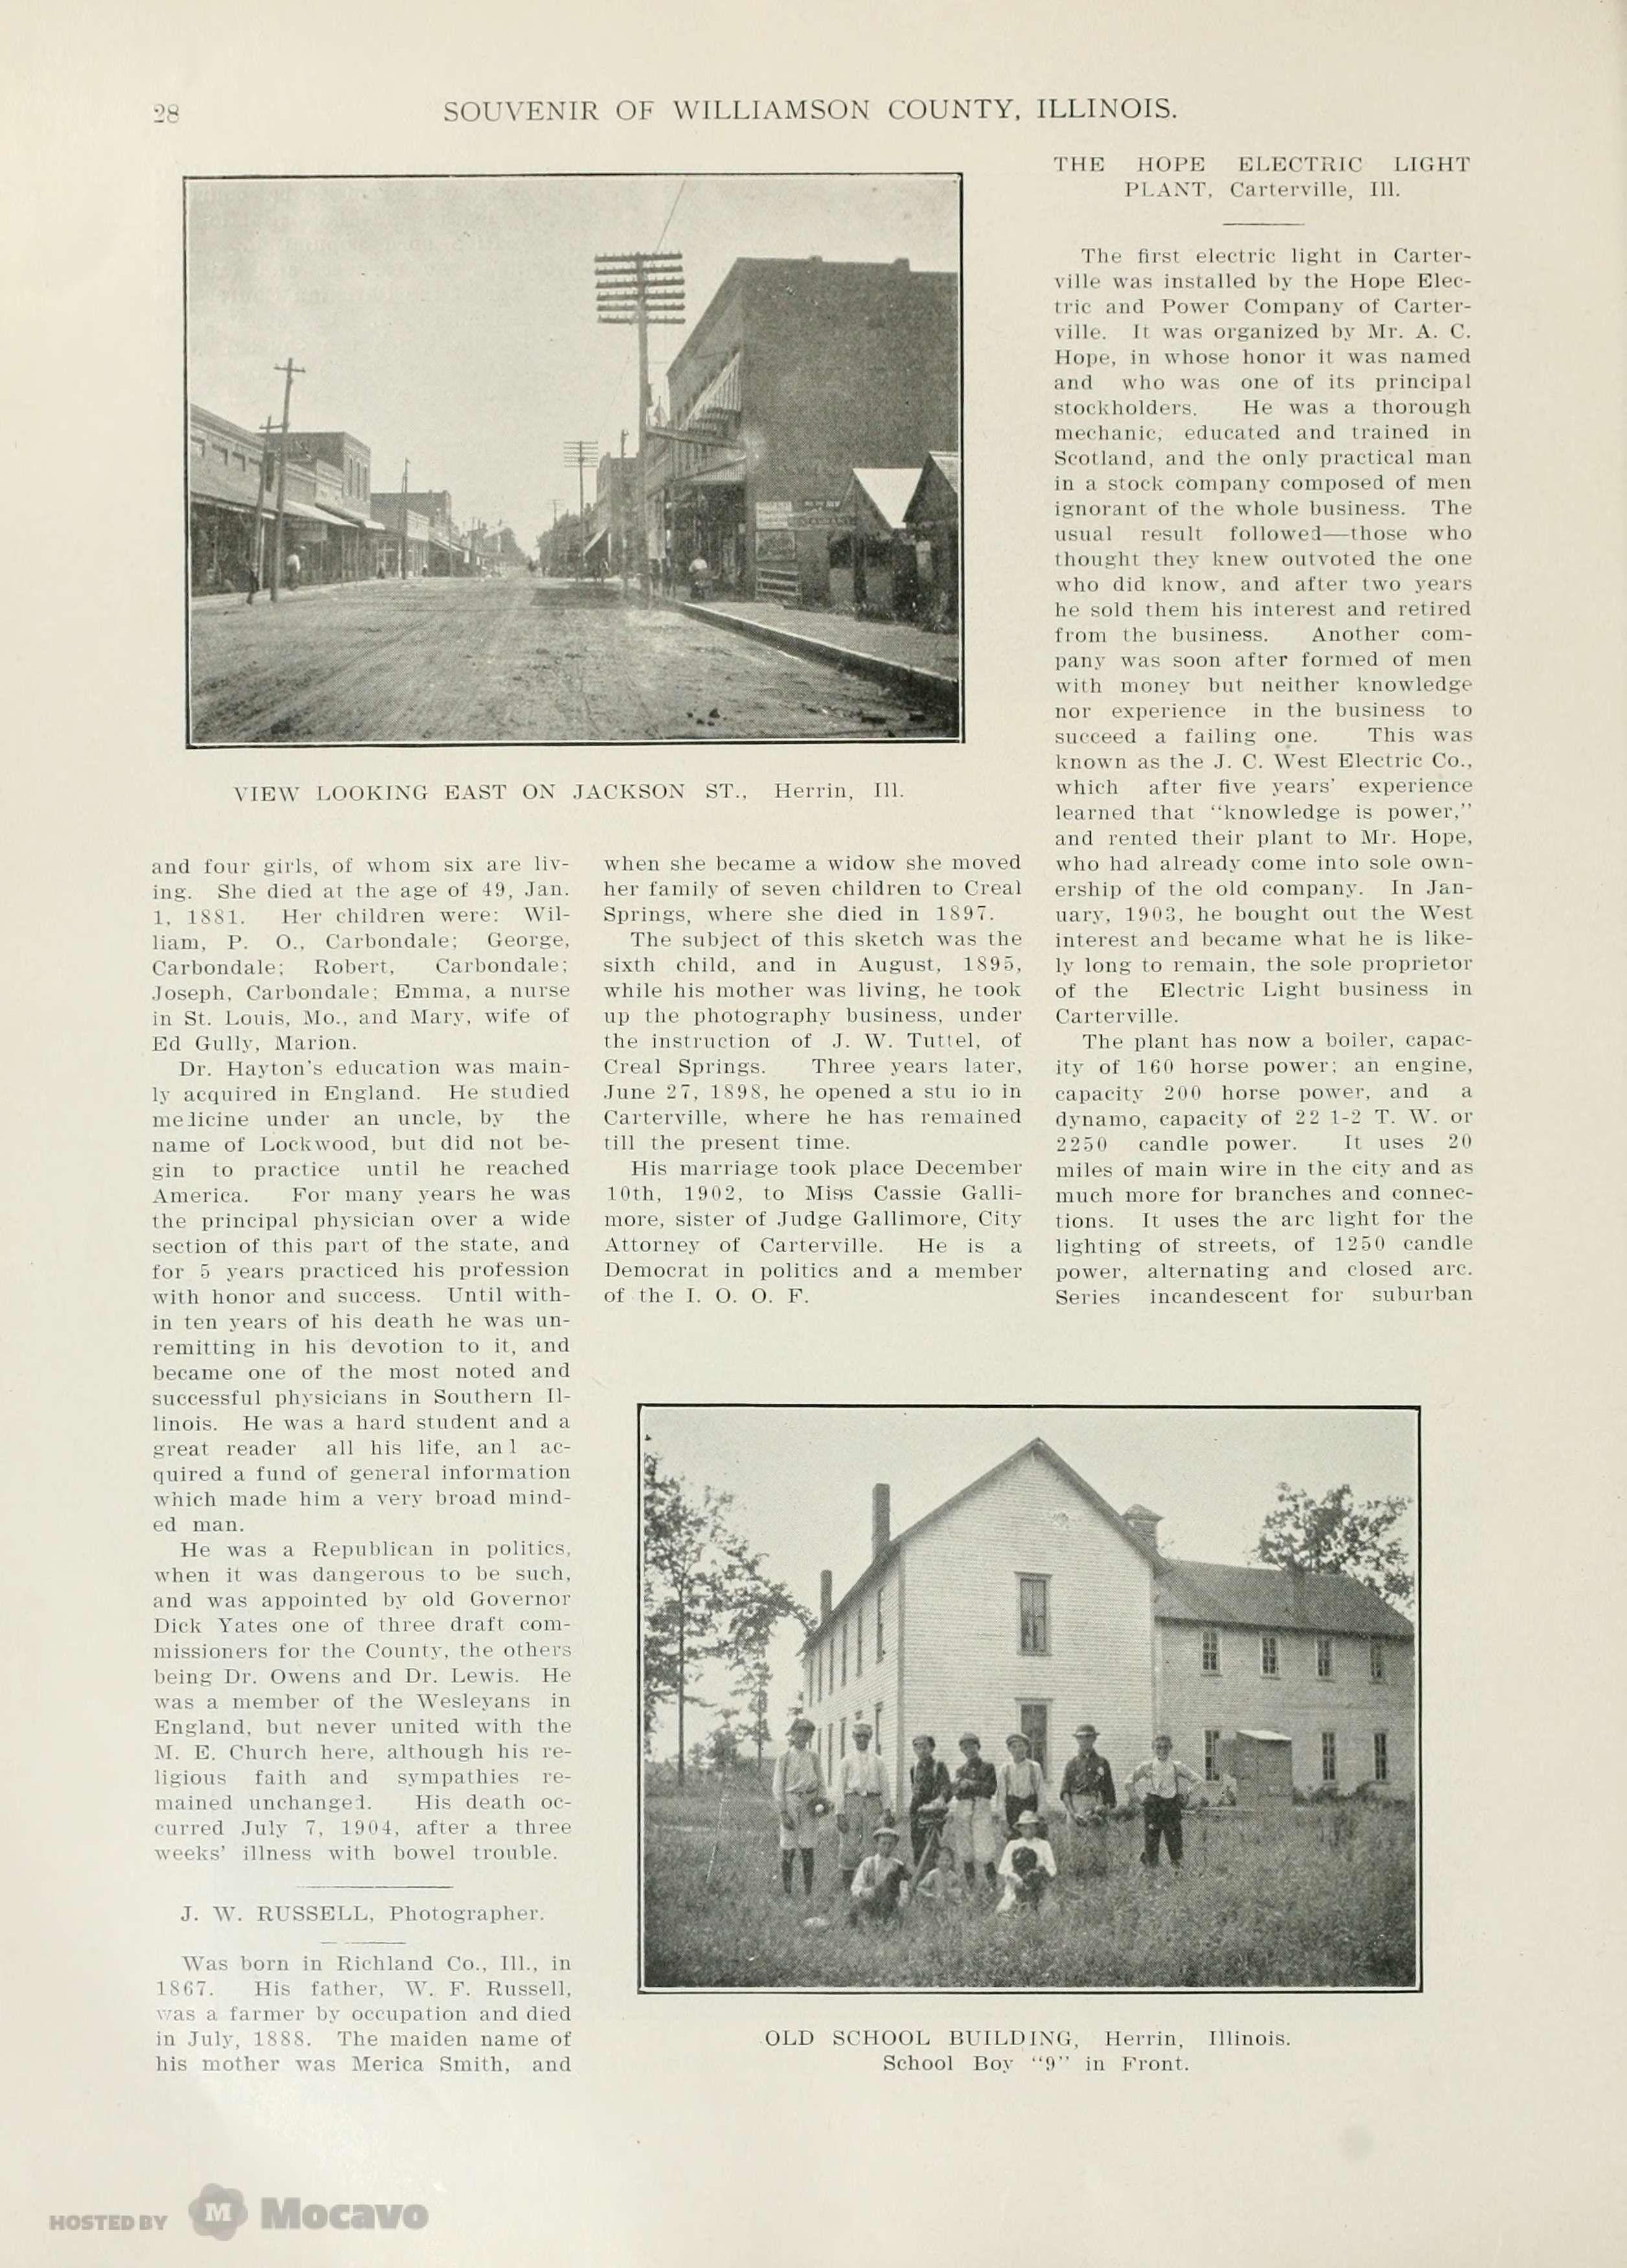 Historical Souvenir Of Williamson County Illinois Page 208 Document Viewer Jackson St Williamson County Illinois